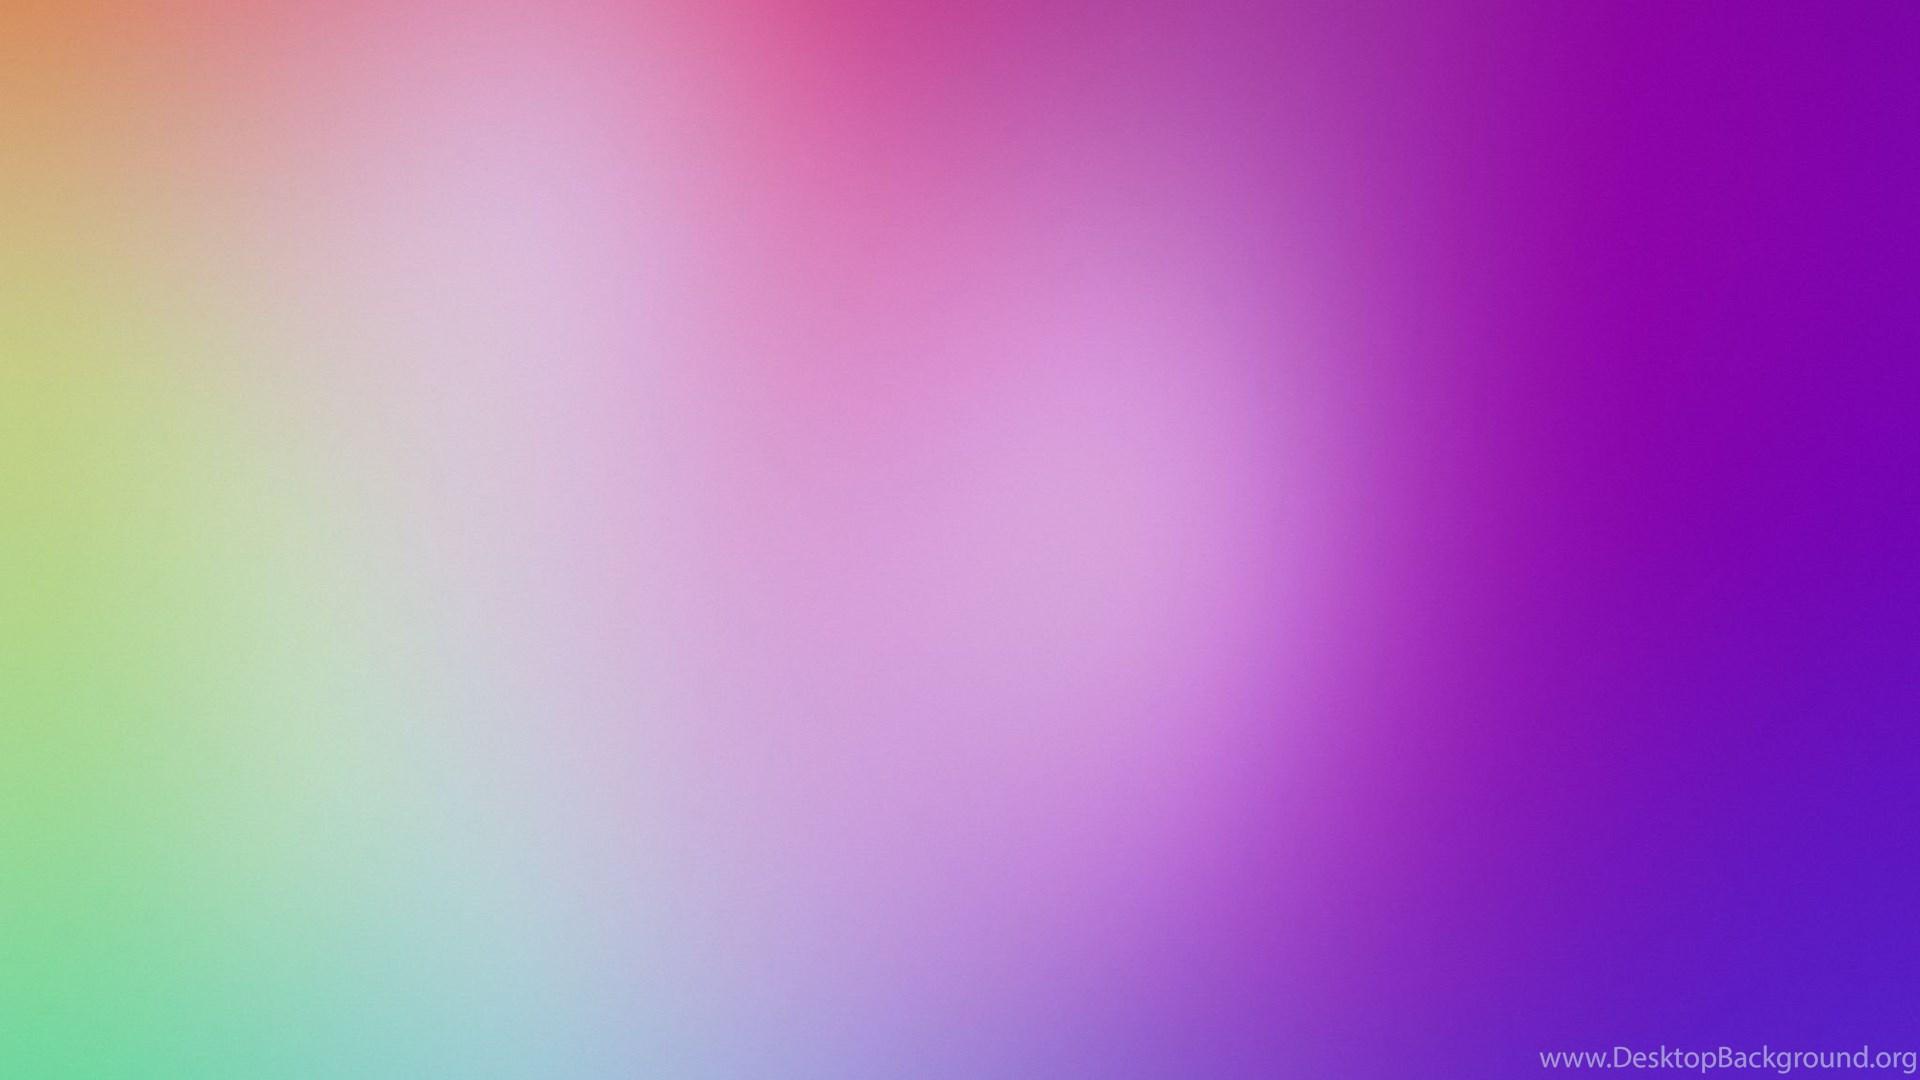 Hd Wallpapers Of Ipad A: New Ipad Wallpaper Hd 2048×2048 776 Desktop Background